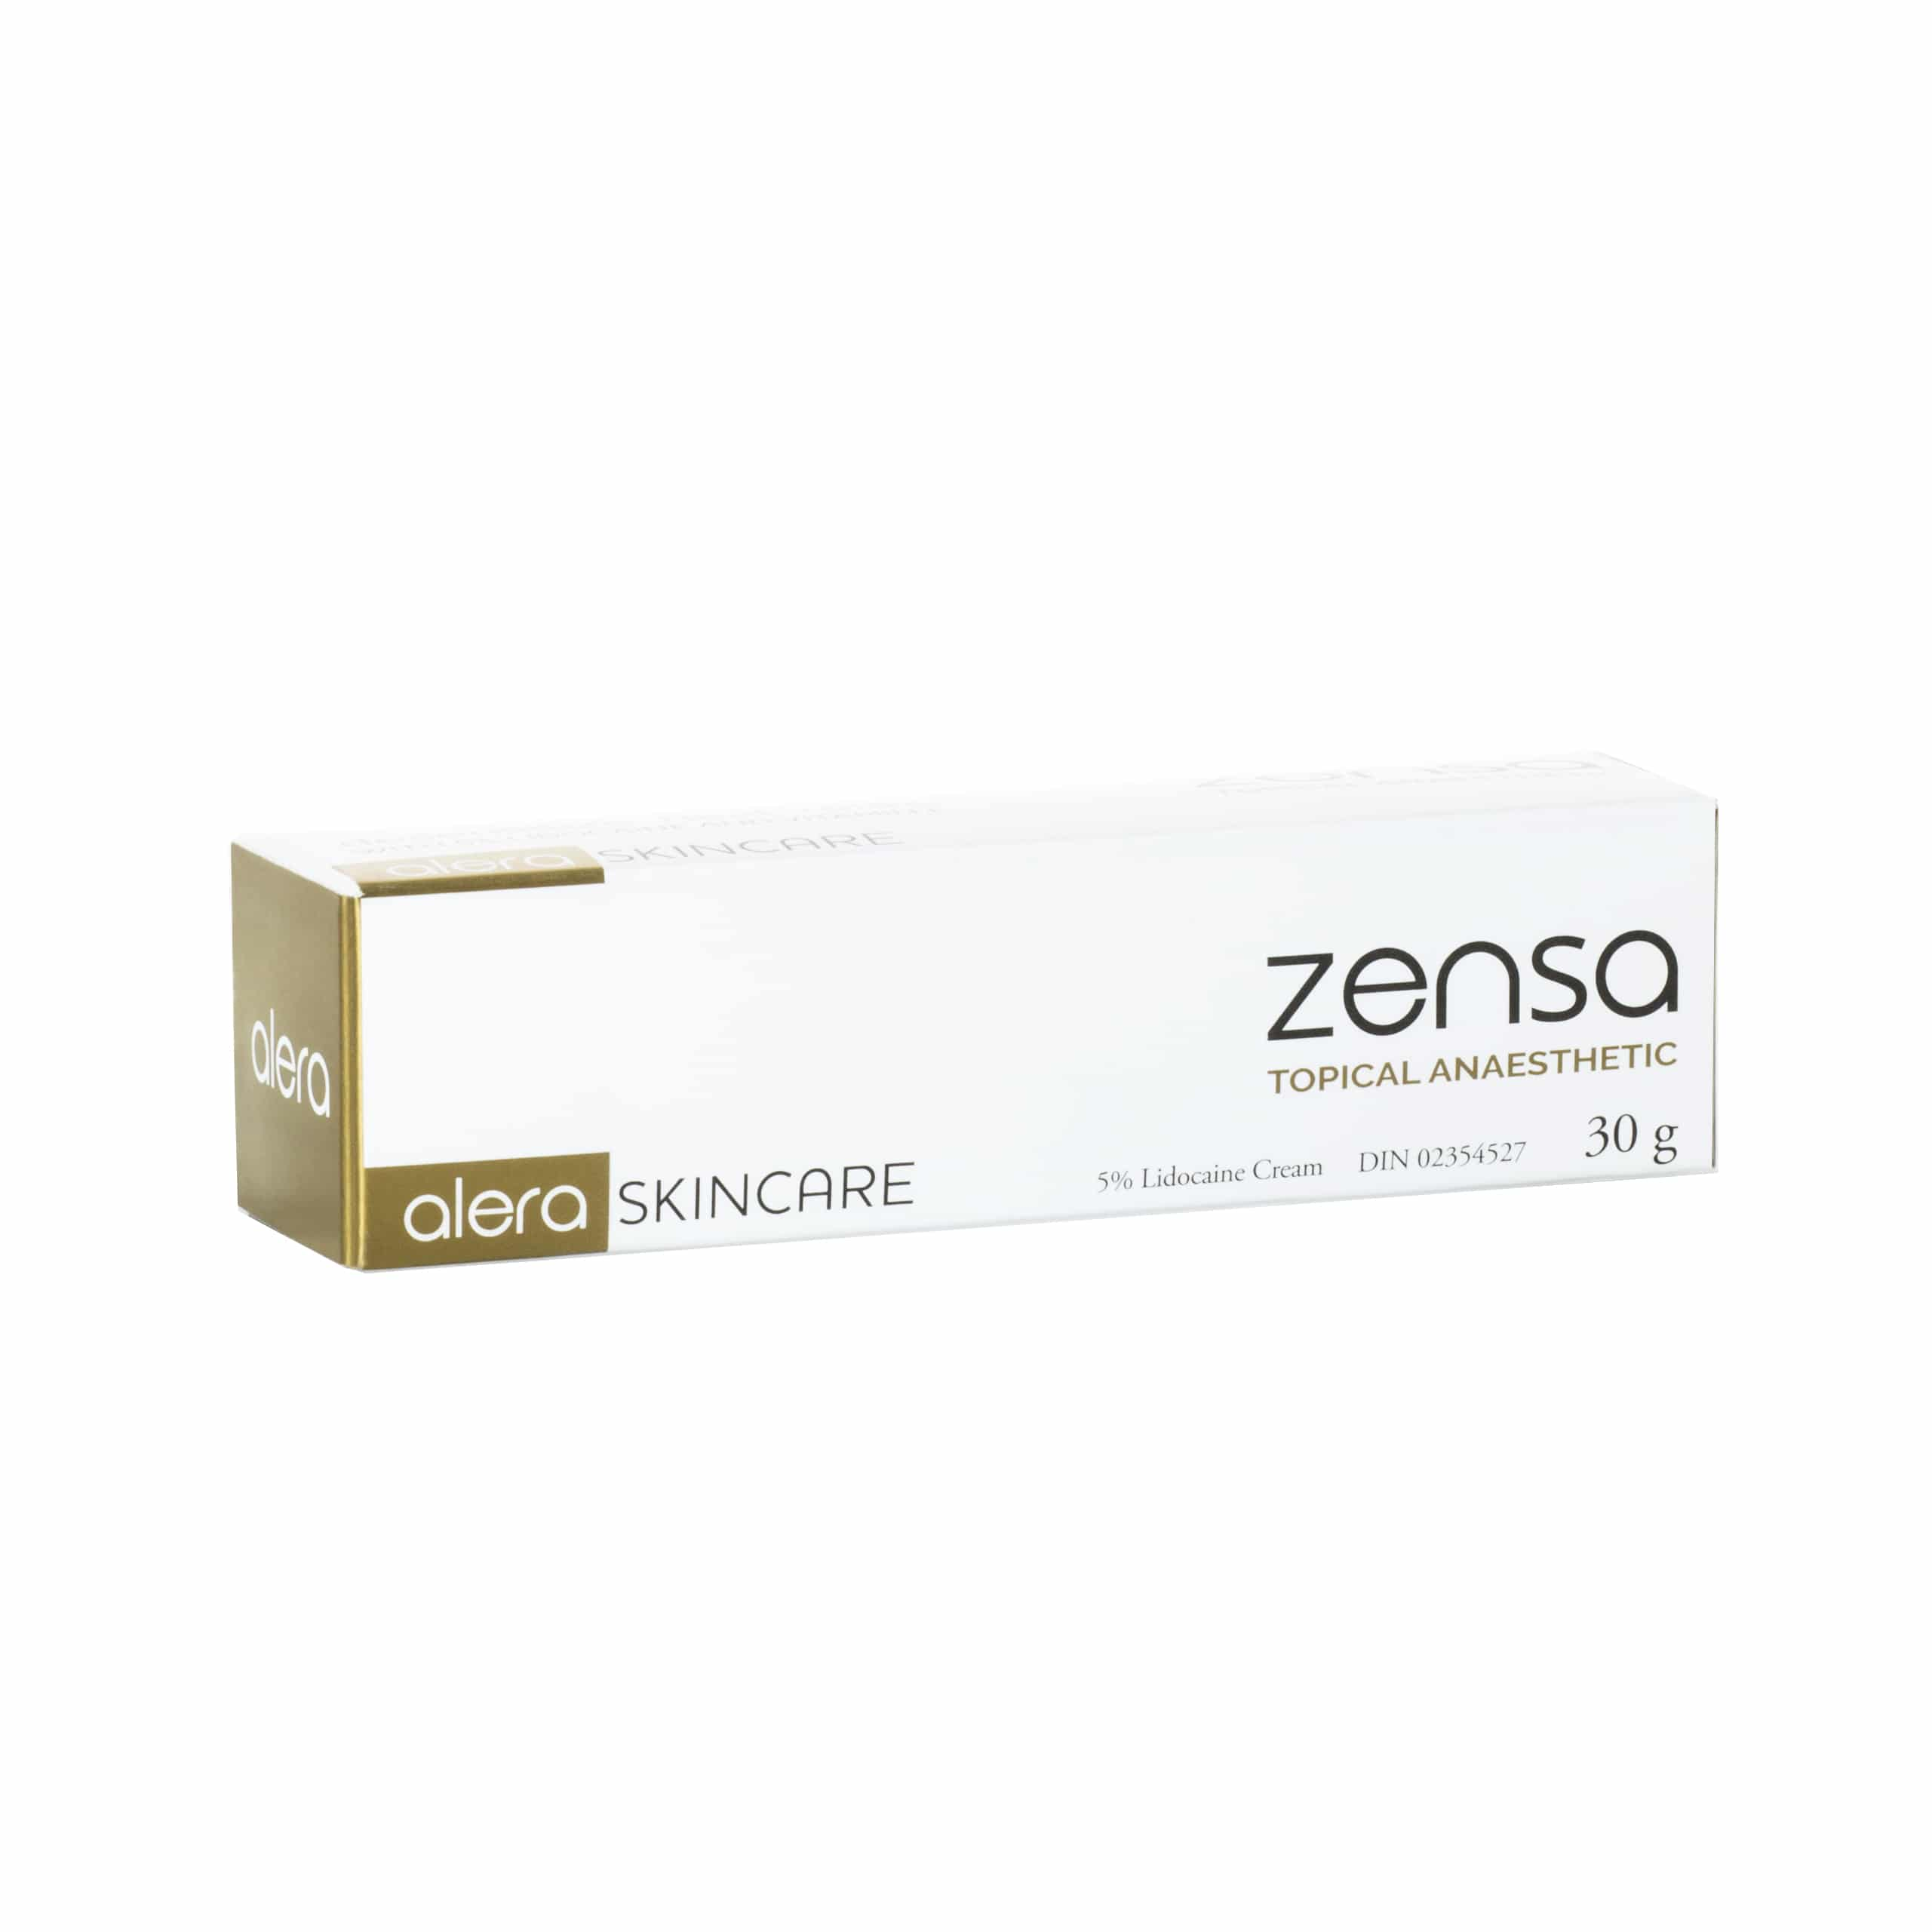 Zensa Tattoo Topical Anesthetic Numbing Cream